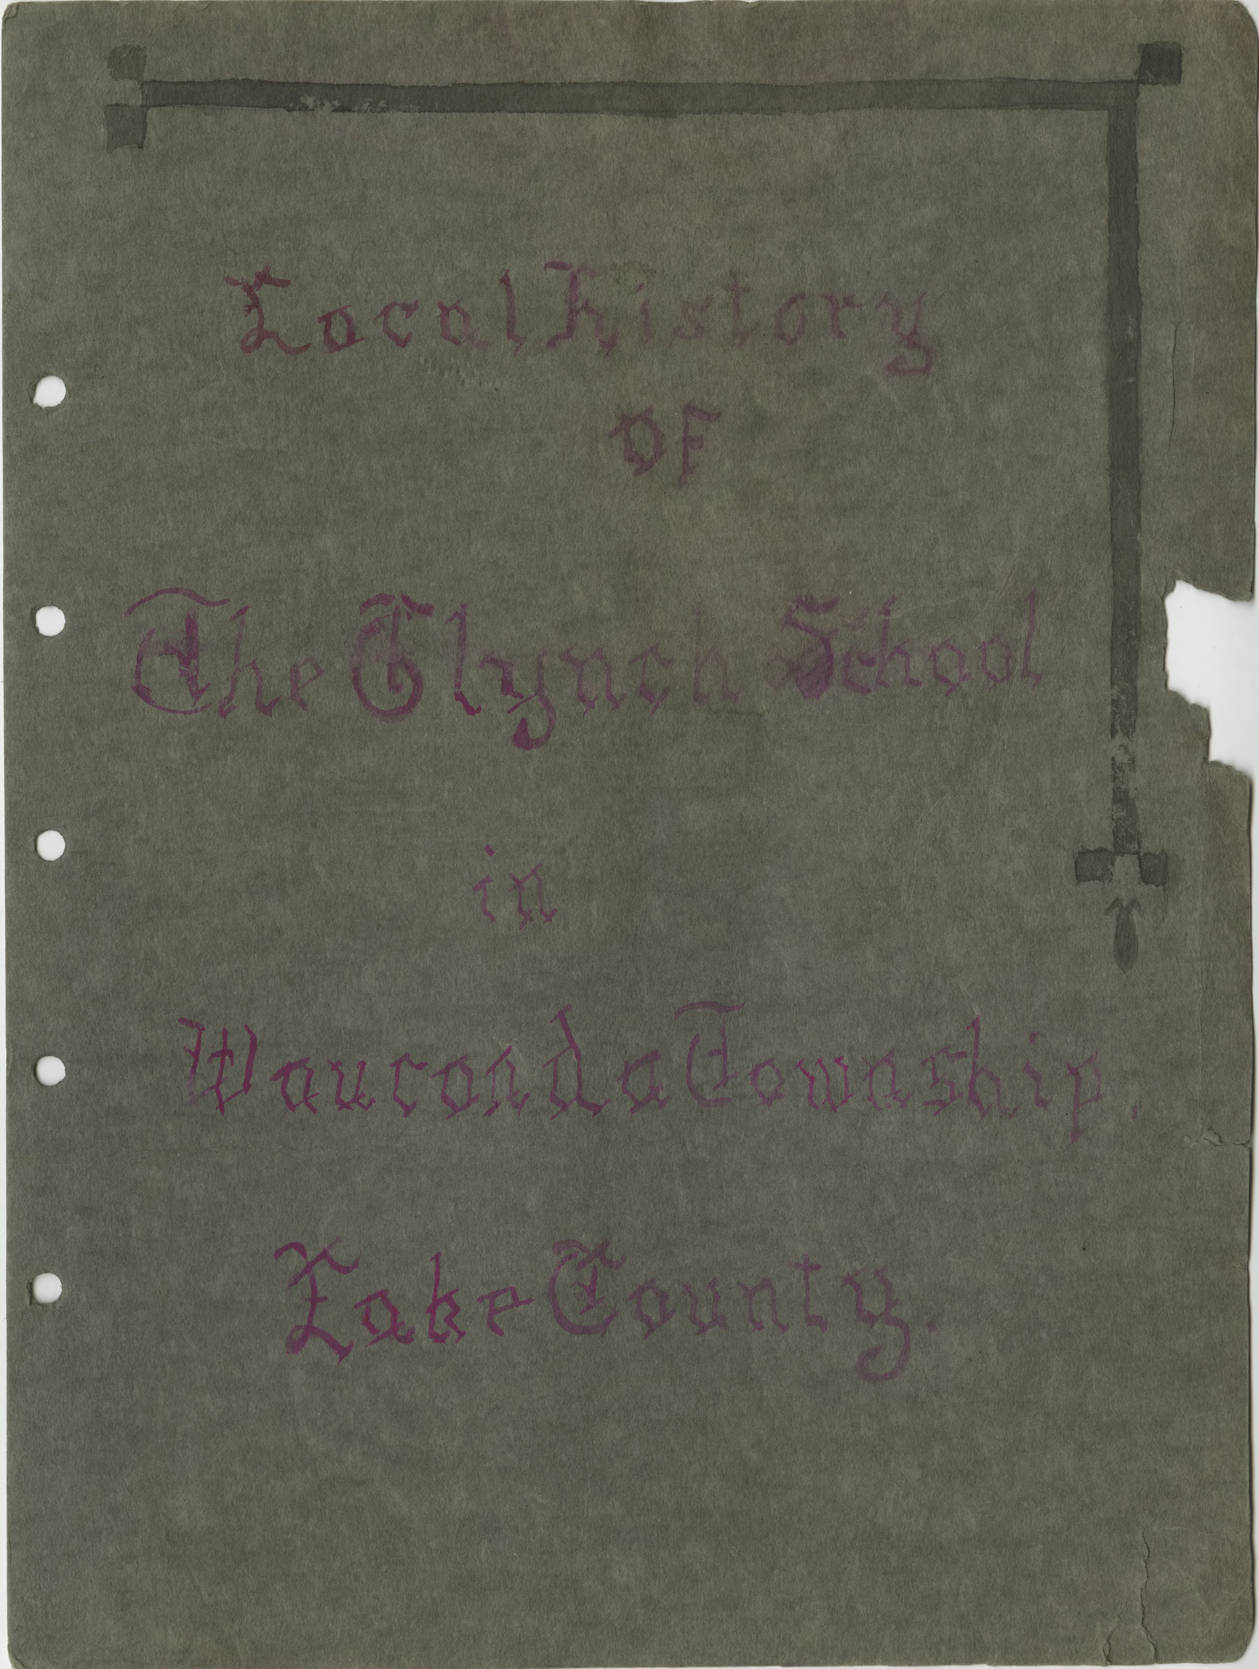 C:\Users\Vern\Documents\Fort Hill\1918 Schools Centennial\1918 Wauconda Twp Glynch School\1918_School_Histories__Wauconda_Township__Glynch_School_2003045_Cover.jpg